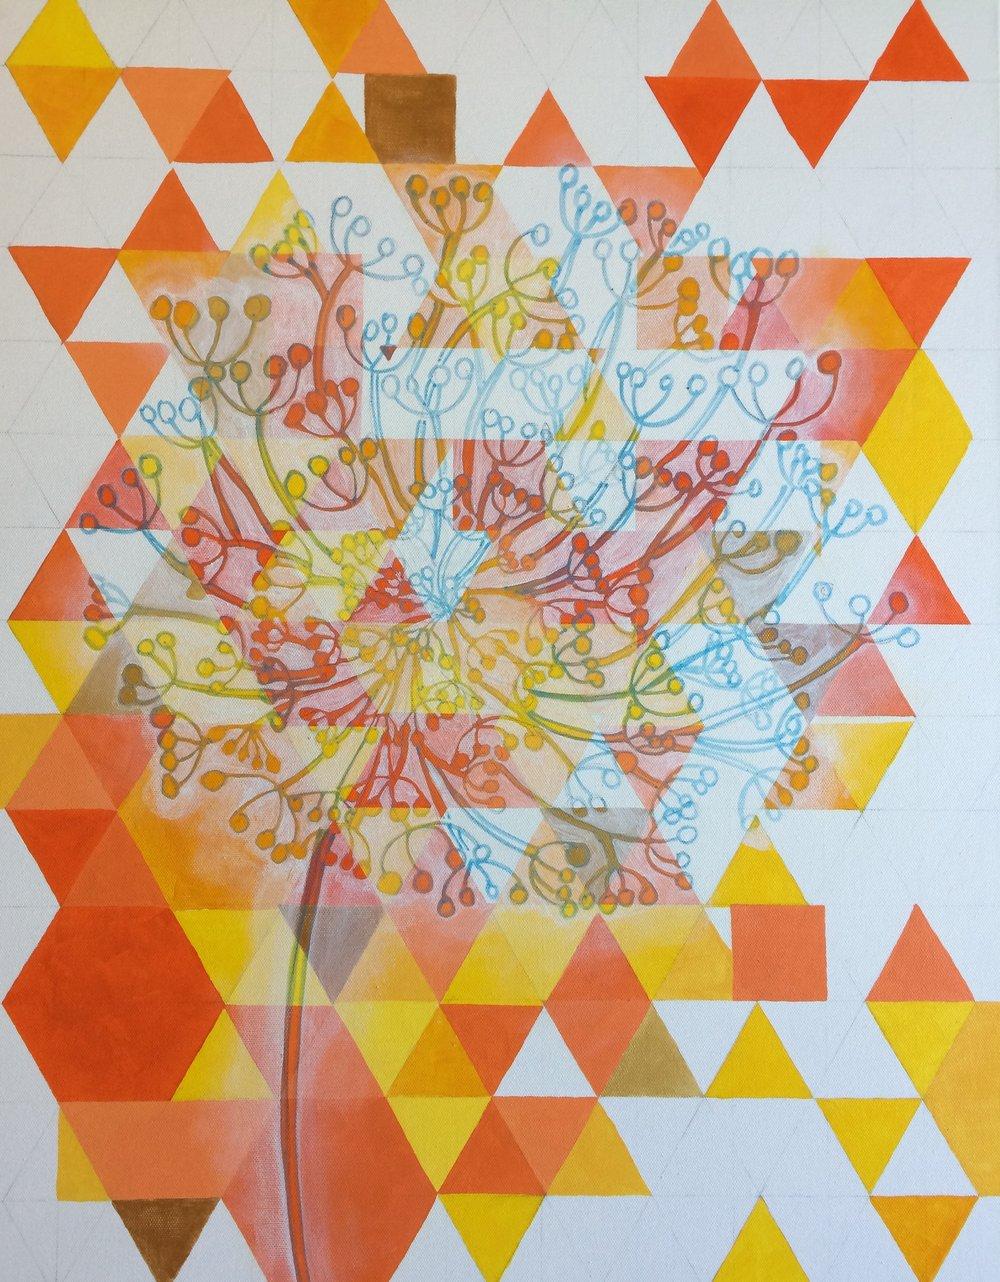 white painted around dandelion